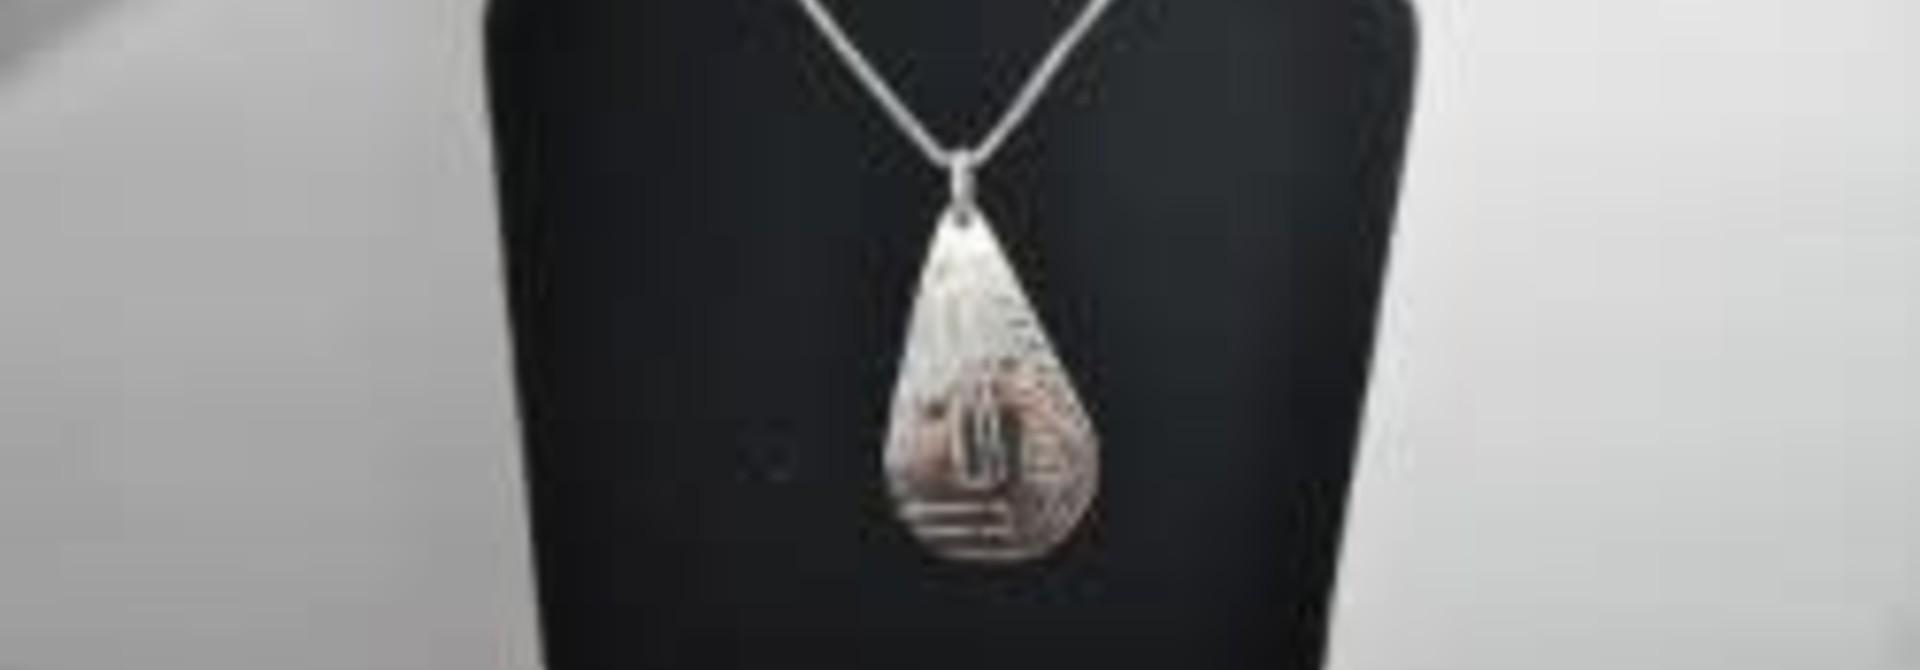 Silver Carved Hummingbird Pendant-04N